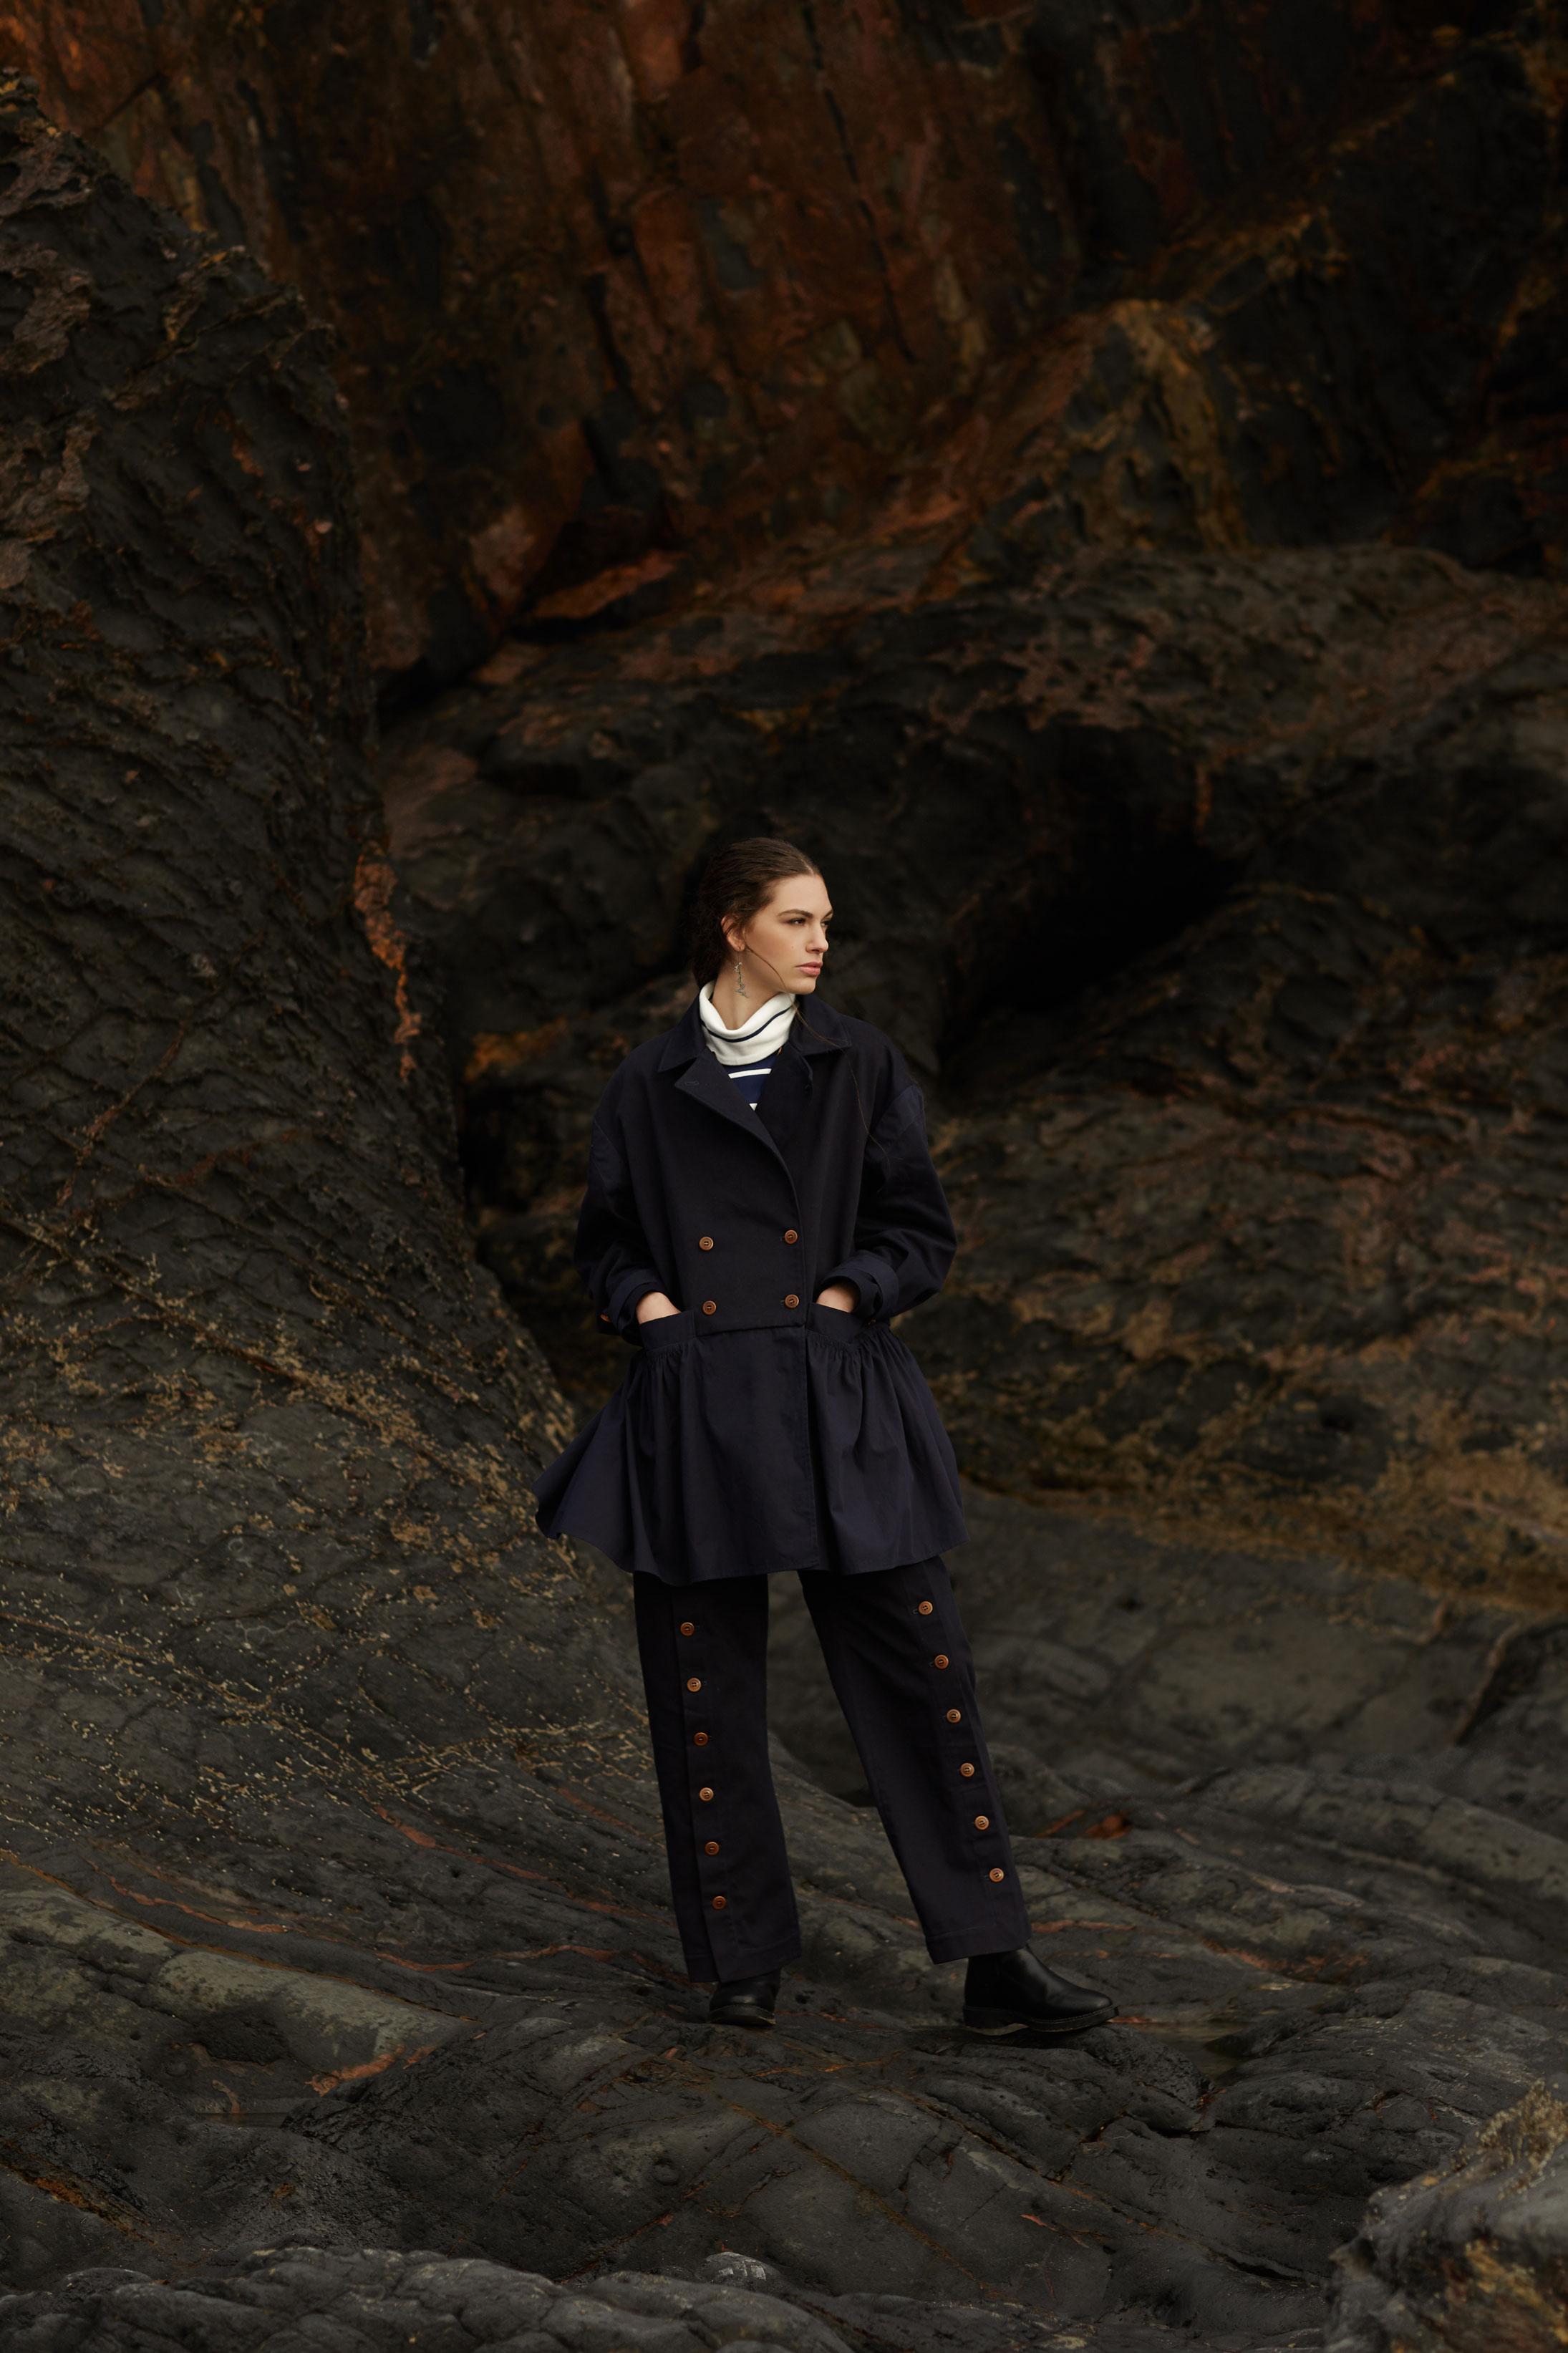 photographe mode pour campagne pub de la styliste Nolwenn Faligot en Bretagne